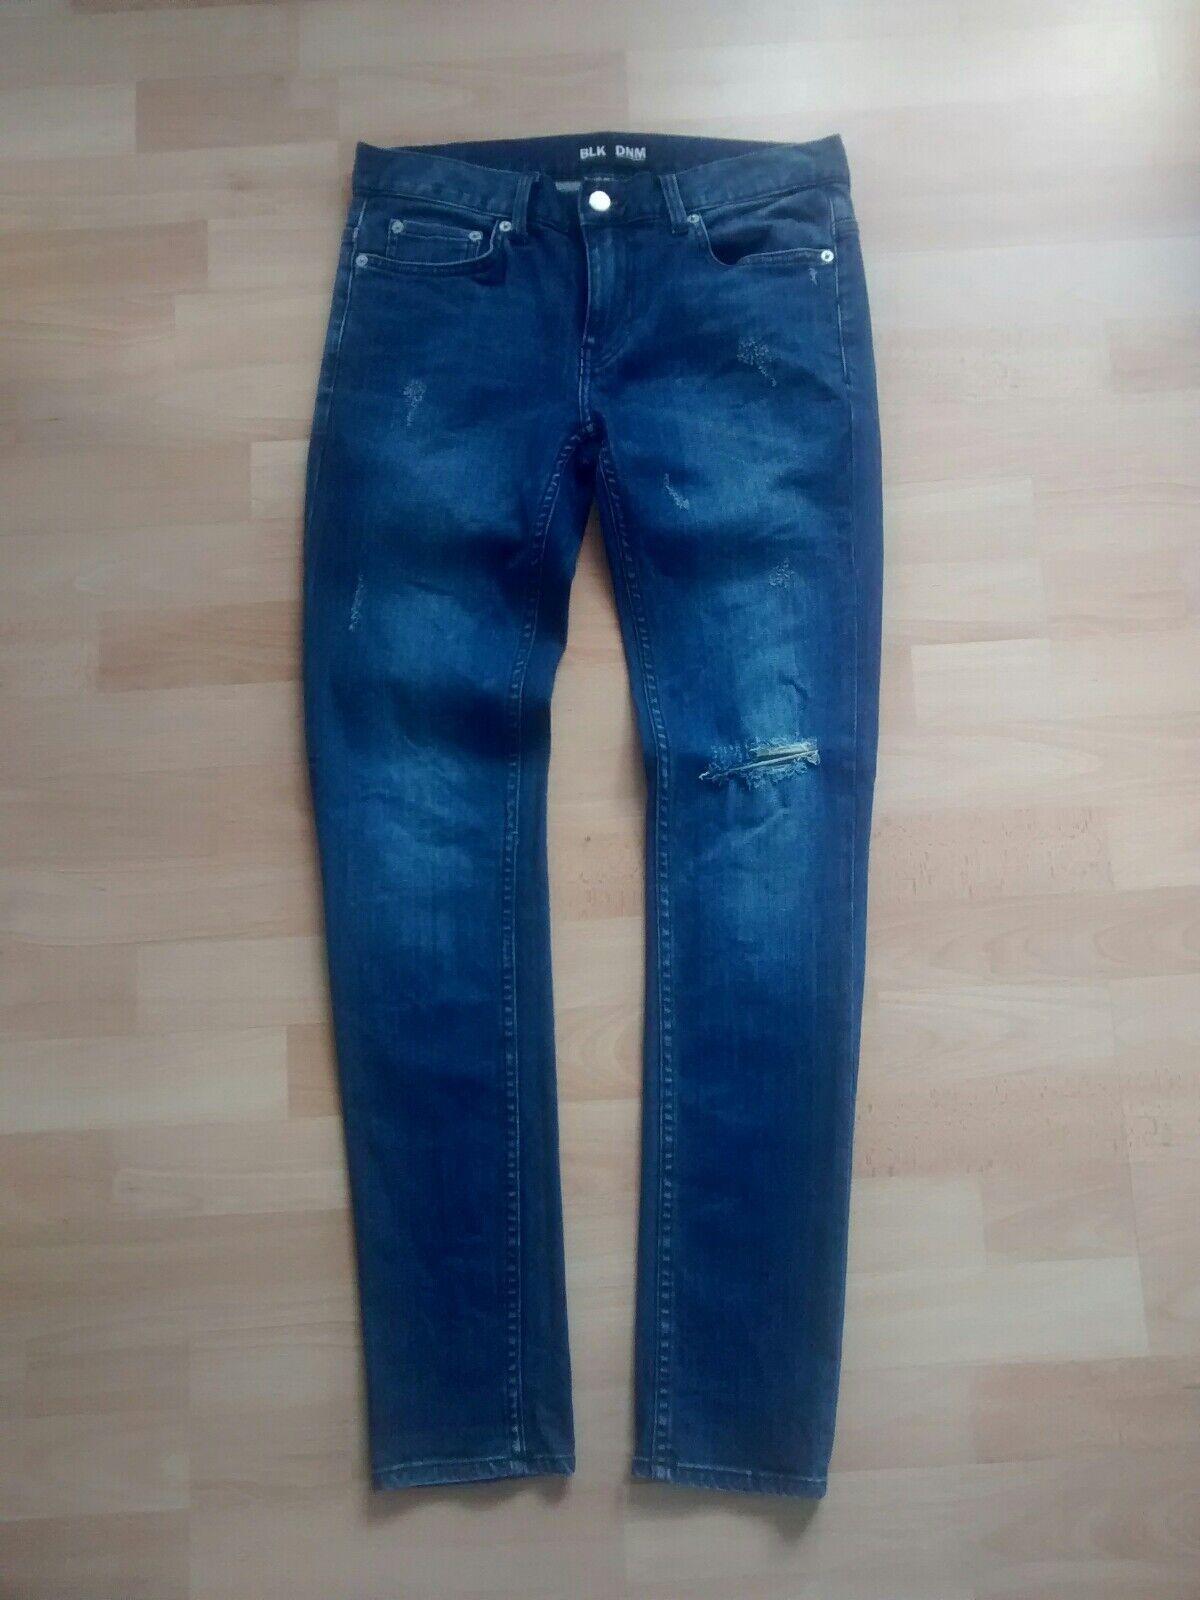 BLK DNM Skinny Jeans 25 Sz 30 32 blau frost Blau ripped wie neu